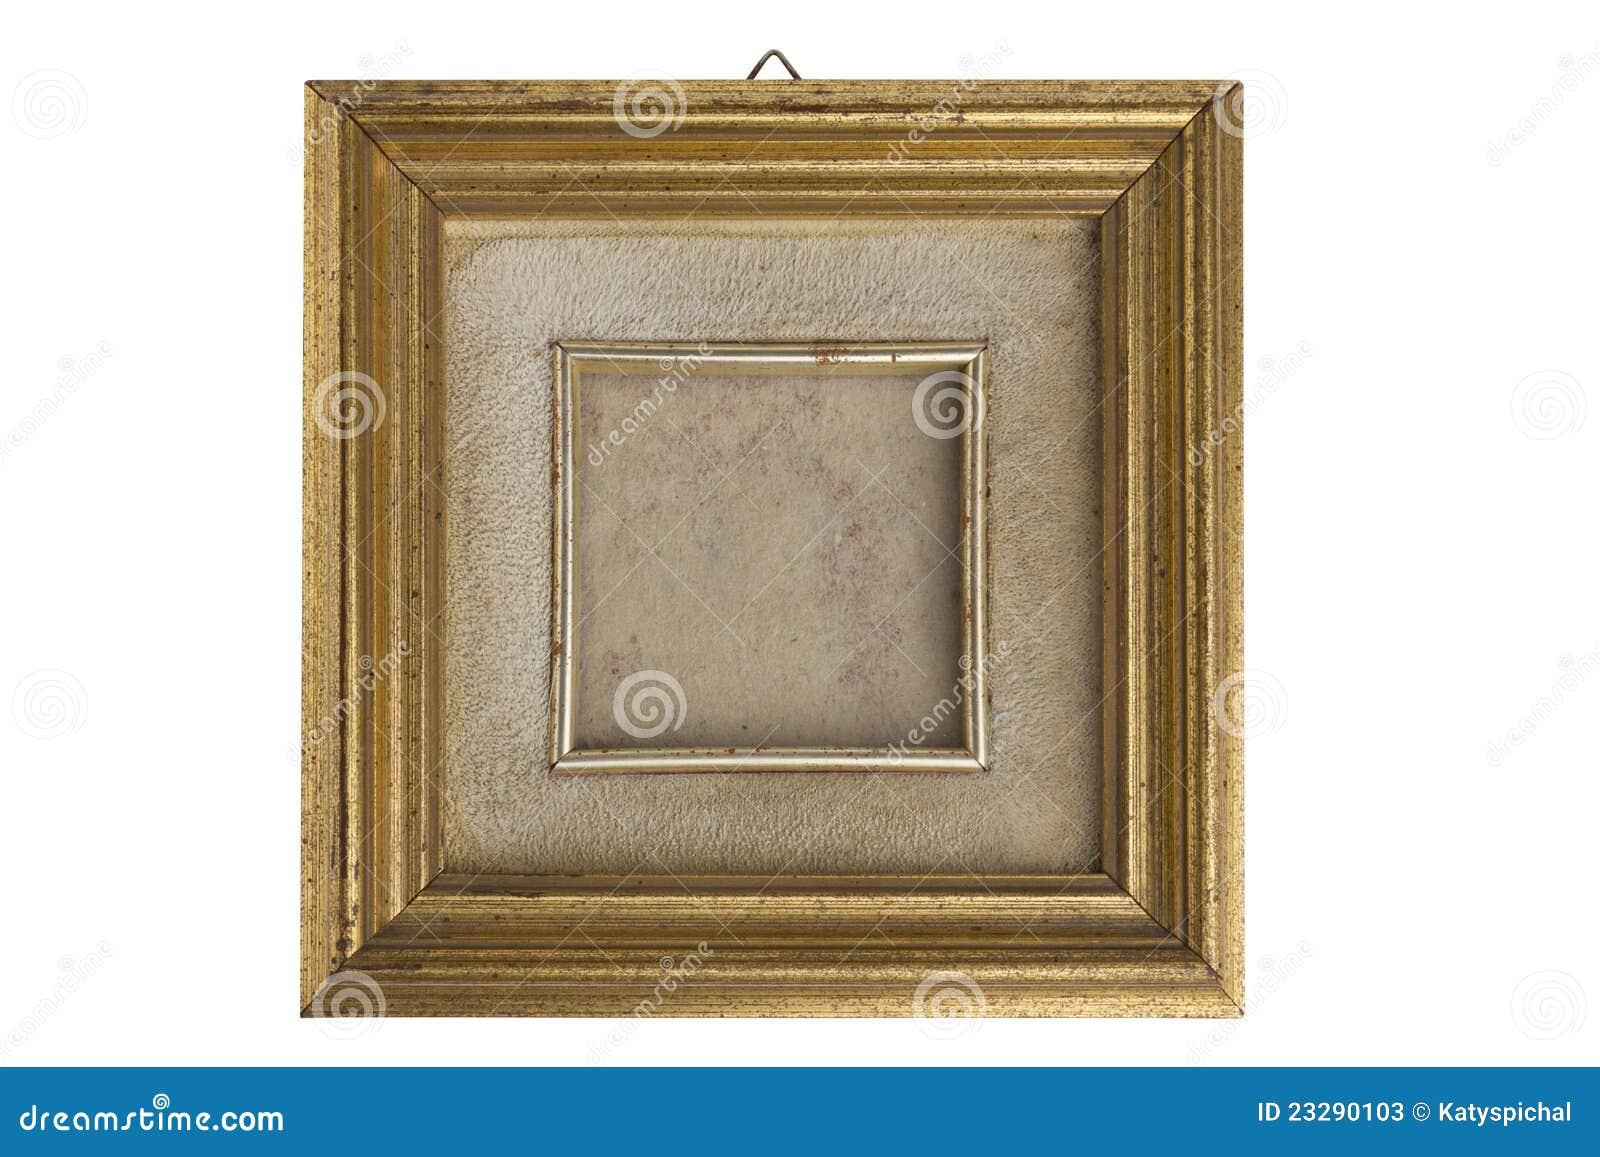 Vergoldeter Bilderrahmen stock abbildung. Illustration von deco ...